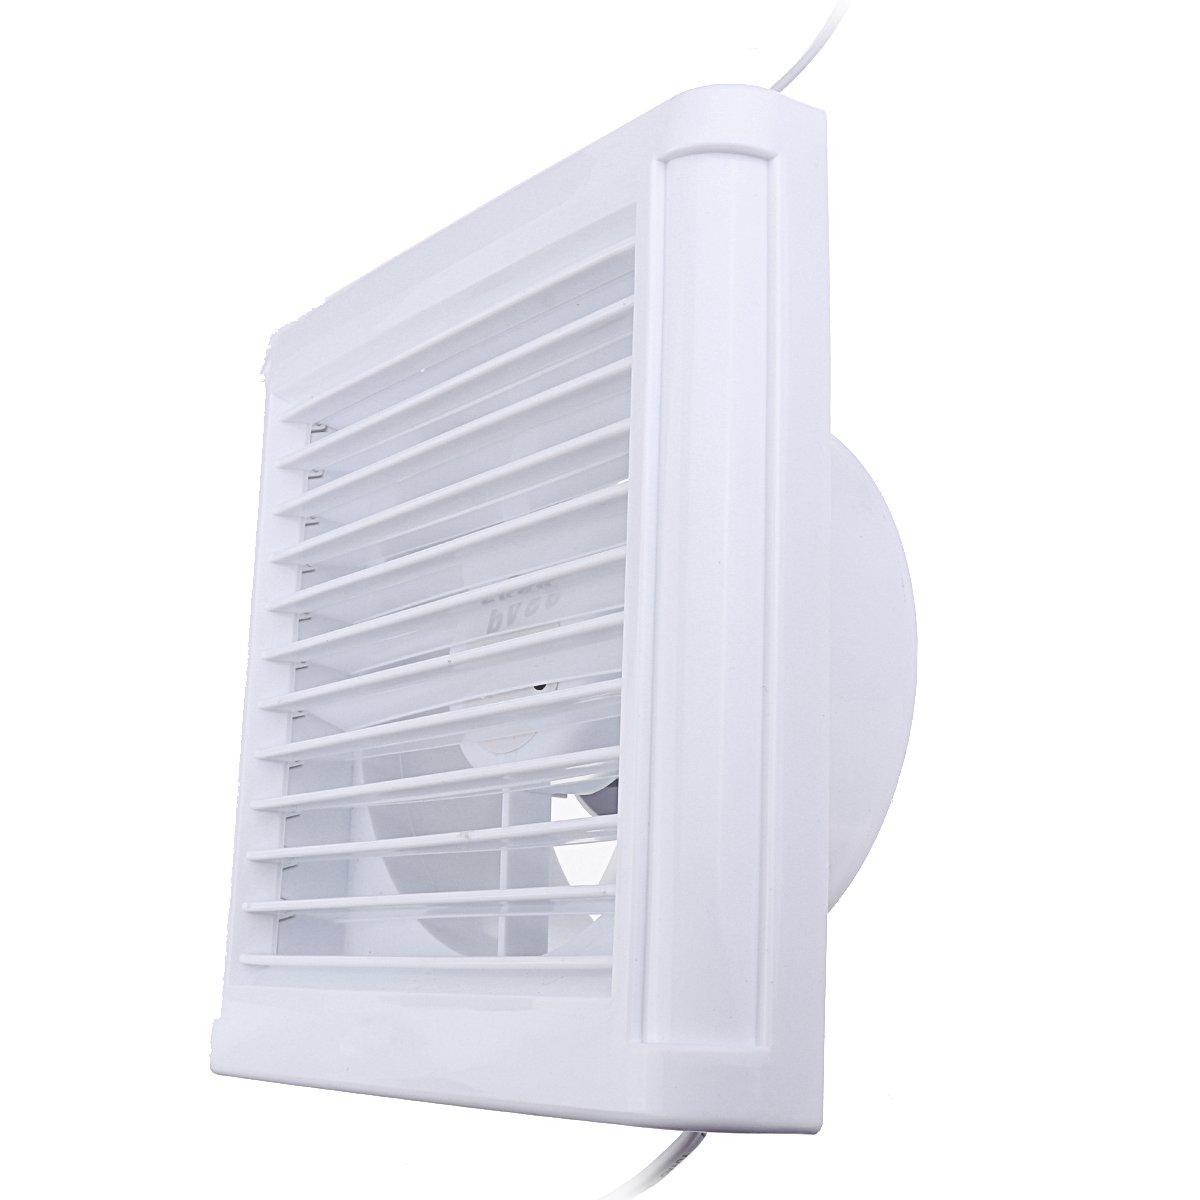 Mute Ventilation Extractor Exhaust Fan Blower Kitchen Bathroom Toilet 4 Inch / 6 Inch